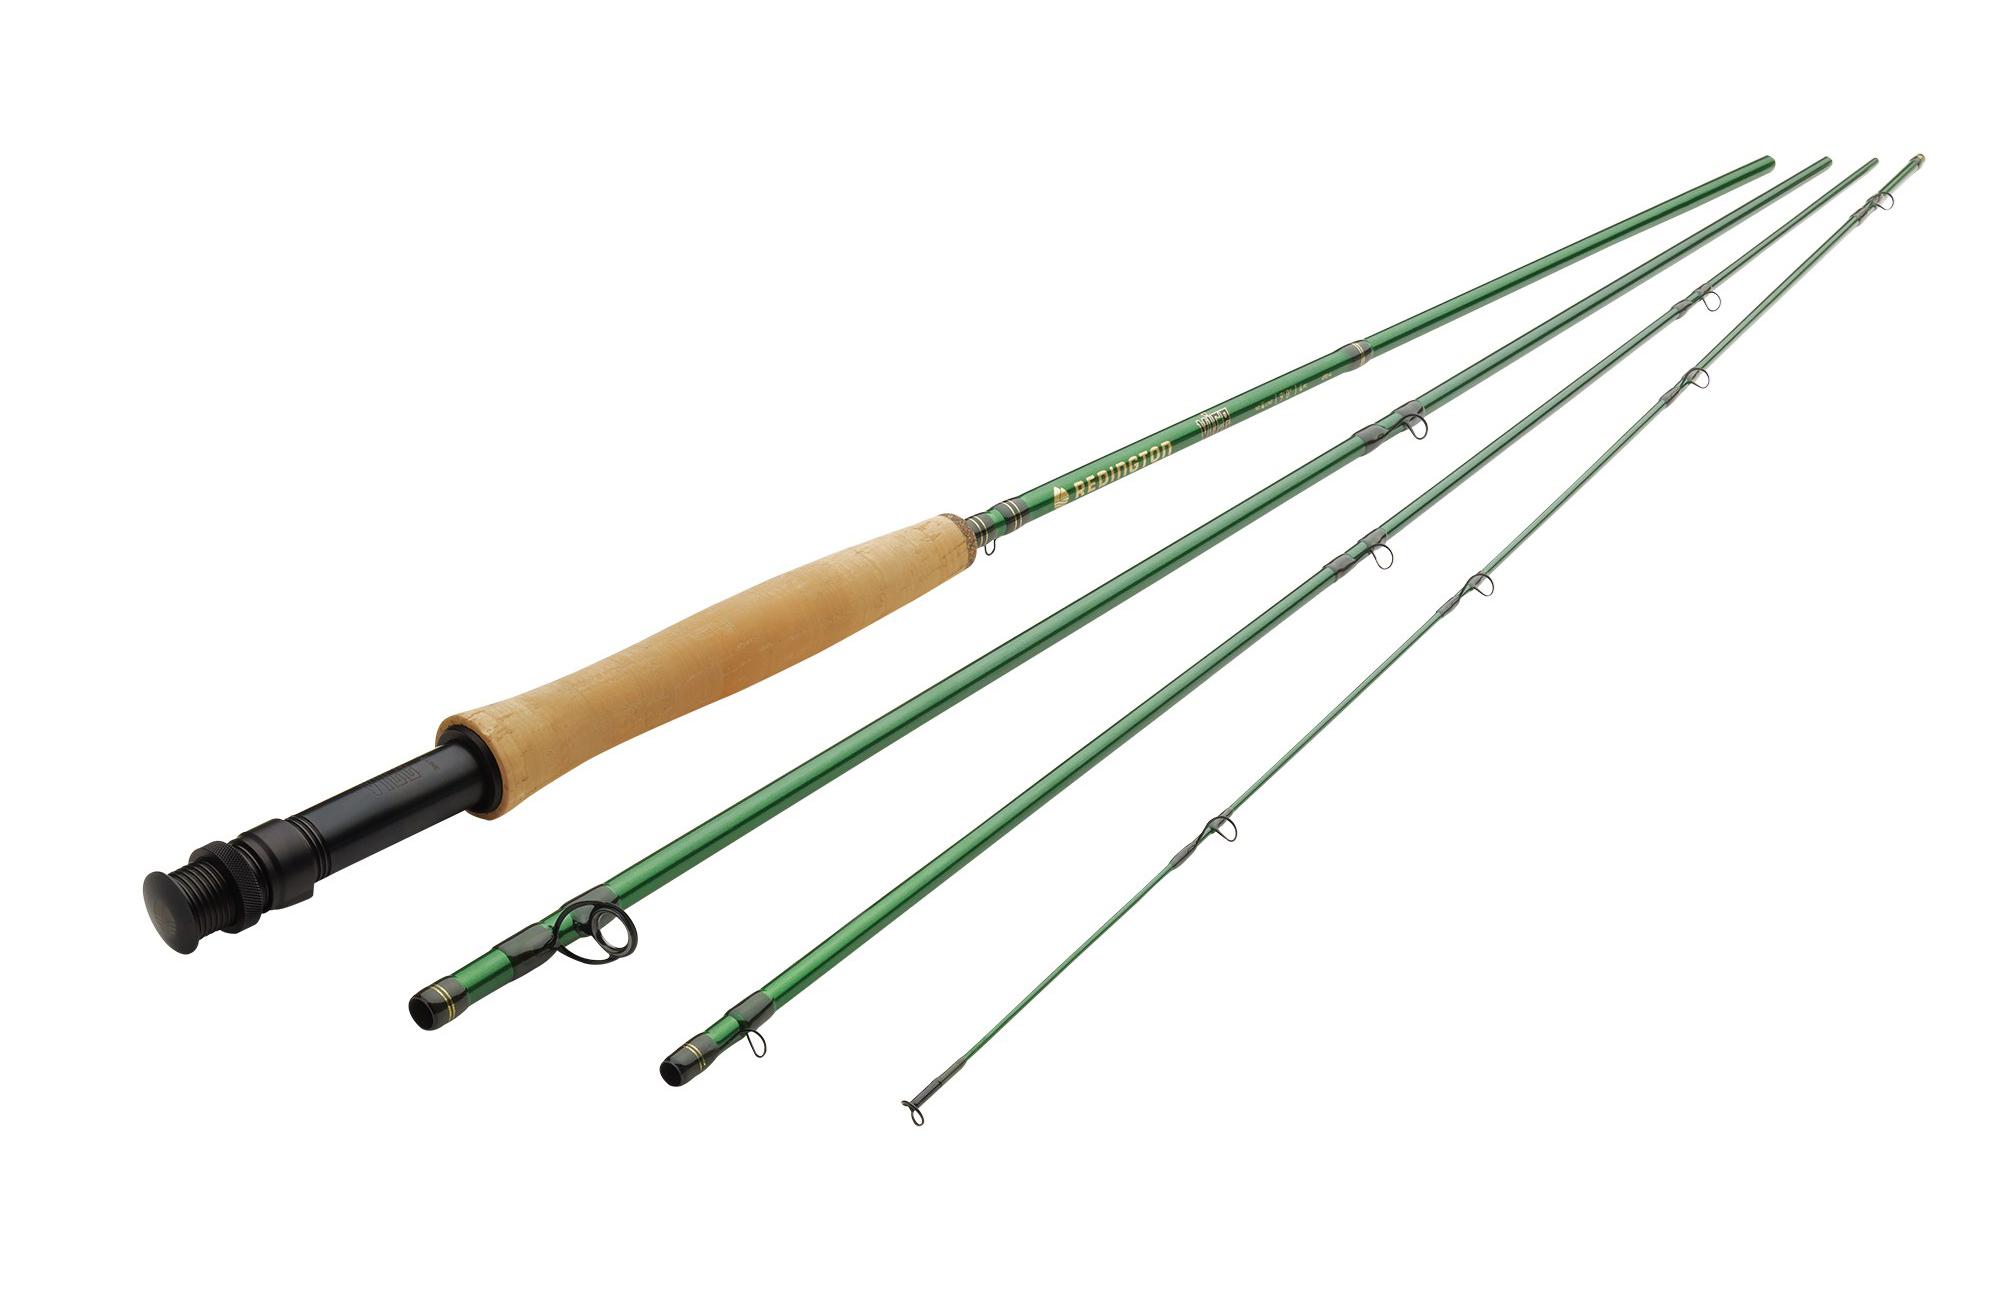 www.tridentflyfishing.com